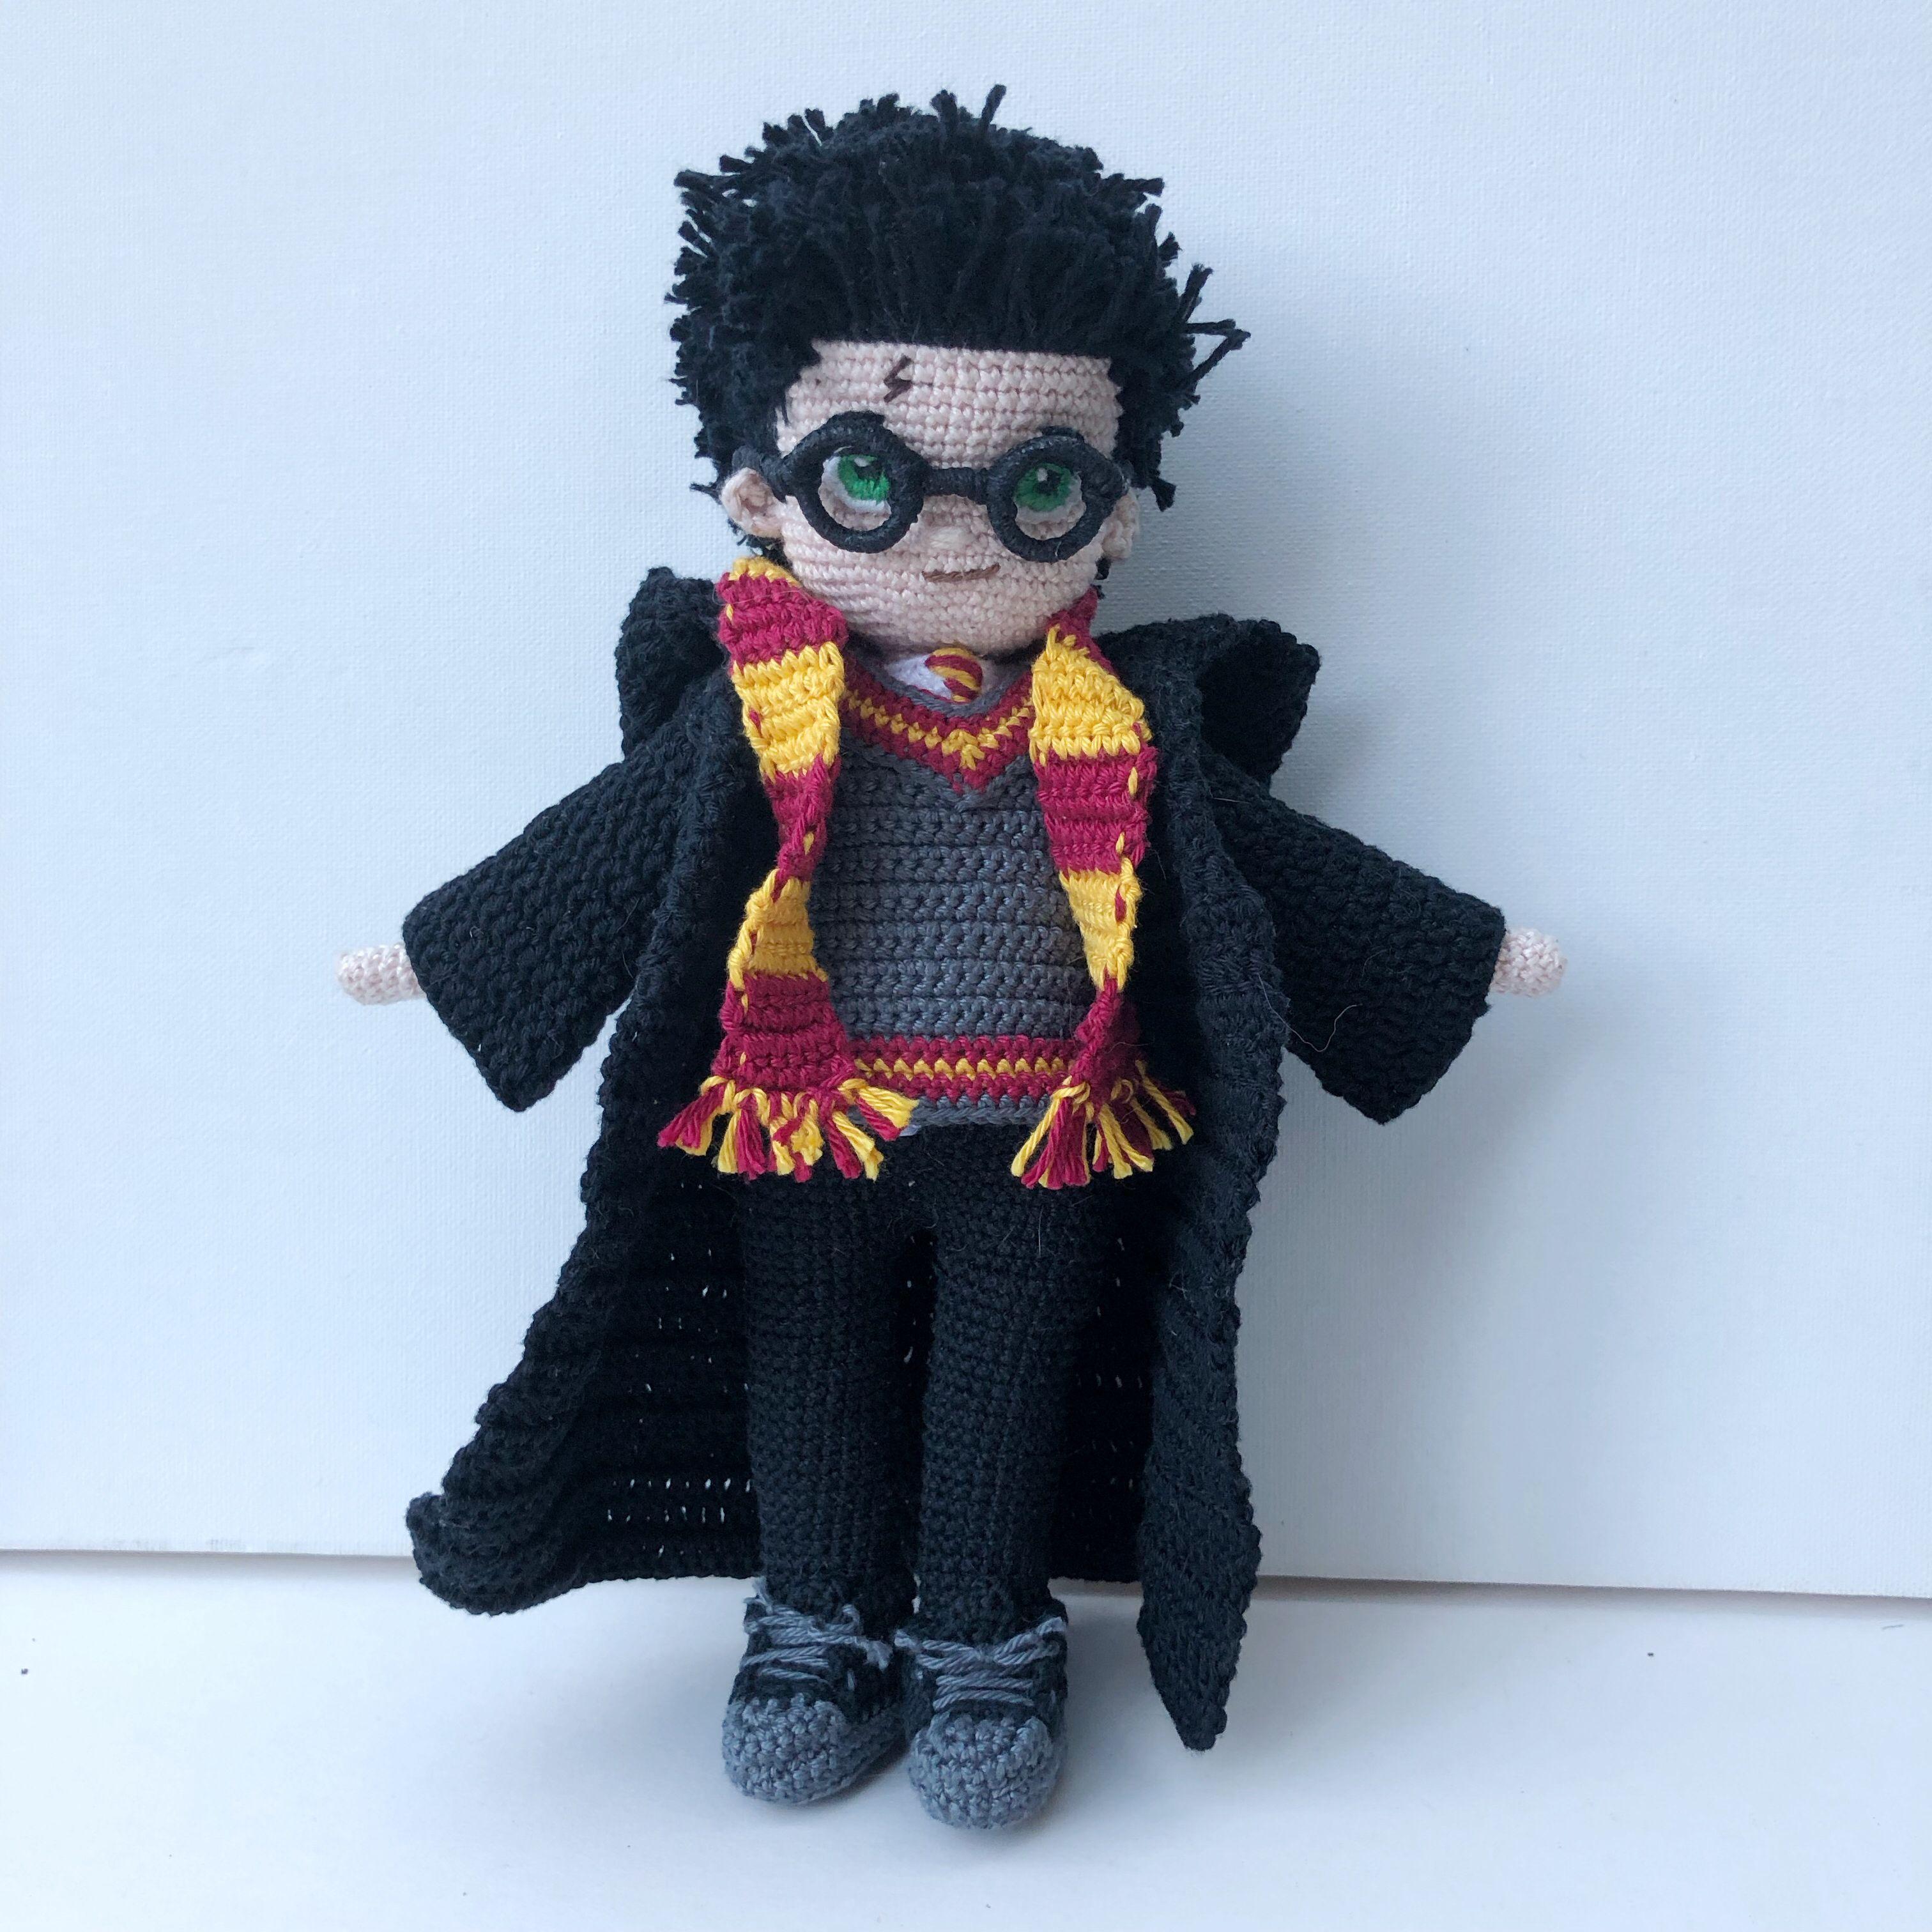 PATTERN - Tobias the Amigurumi Boy Doll (crochet, amigurumi) - in ... | 3024x3024